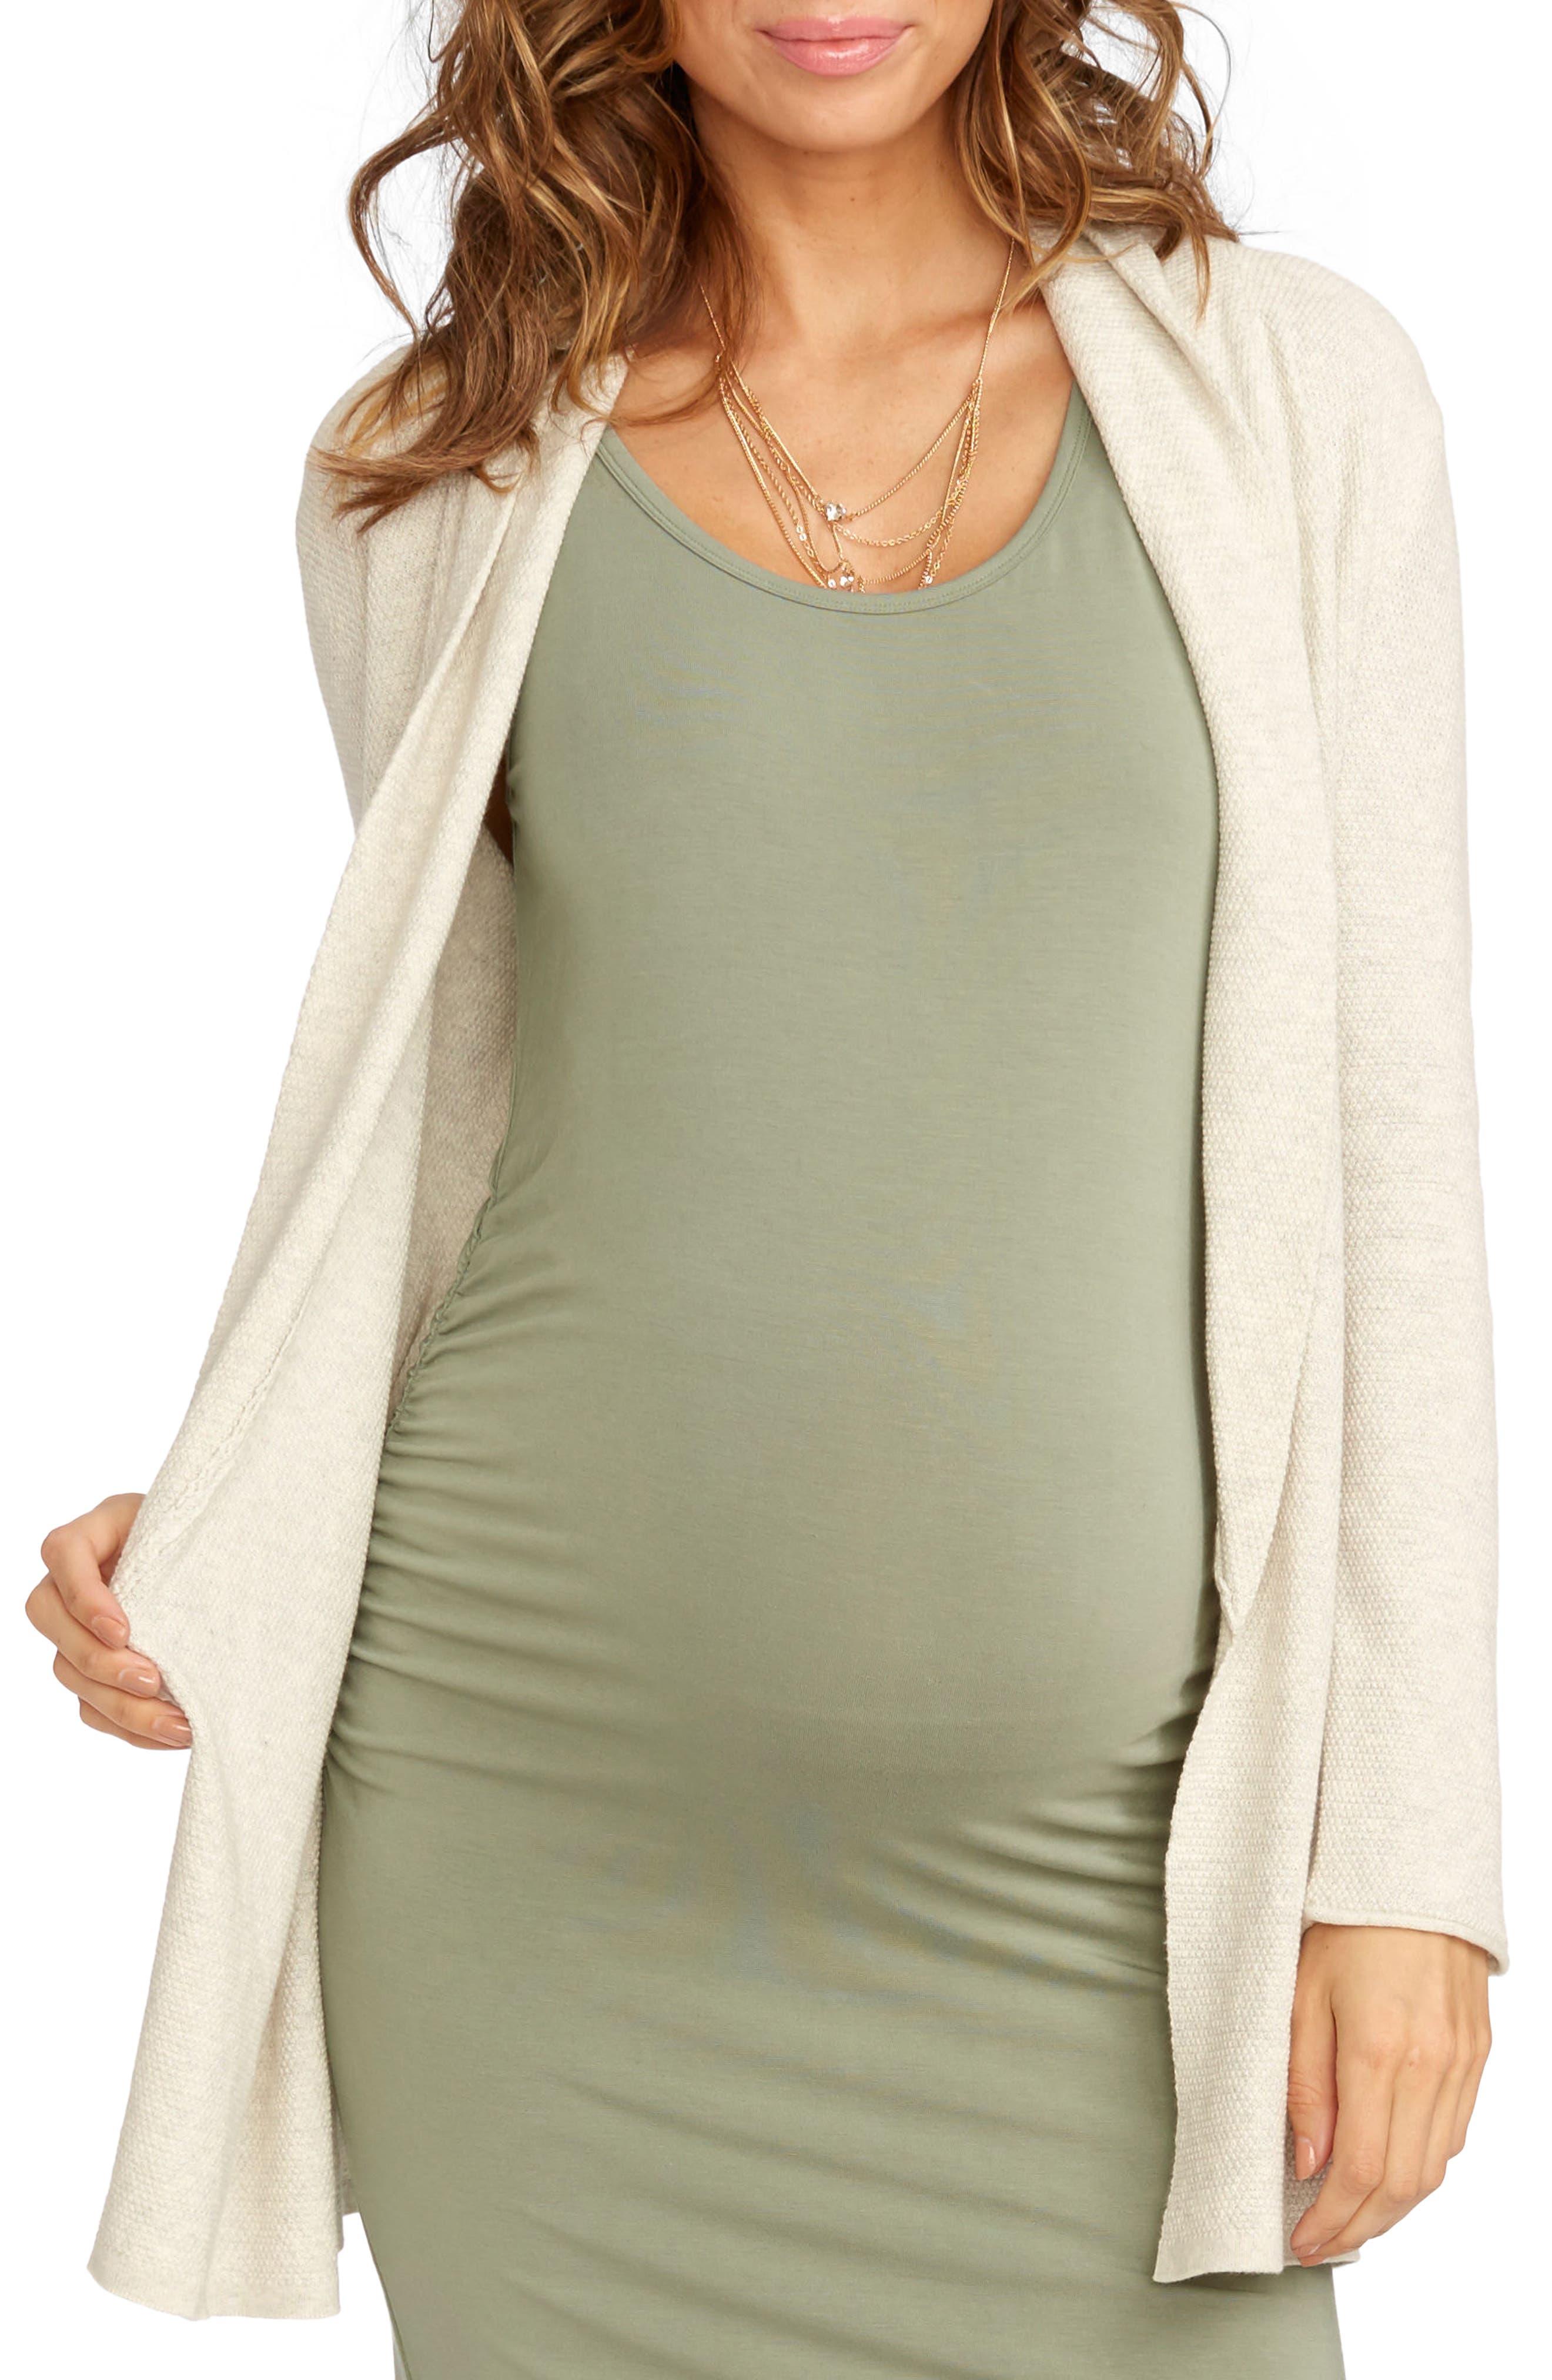 Rosie Pope Taylor Maternity Cardigan